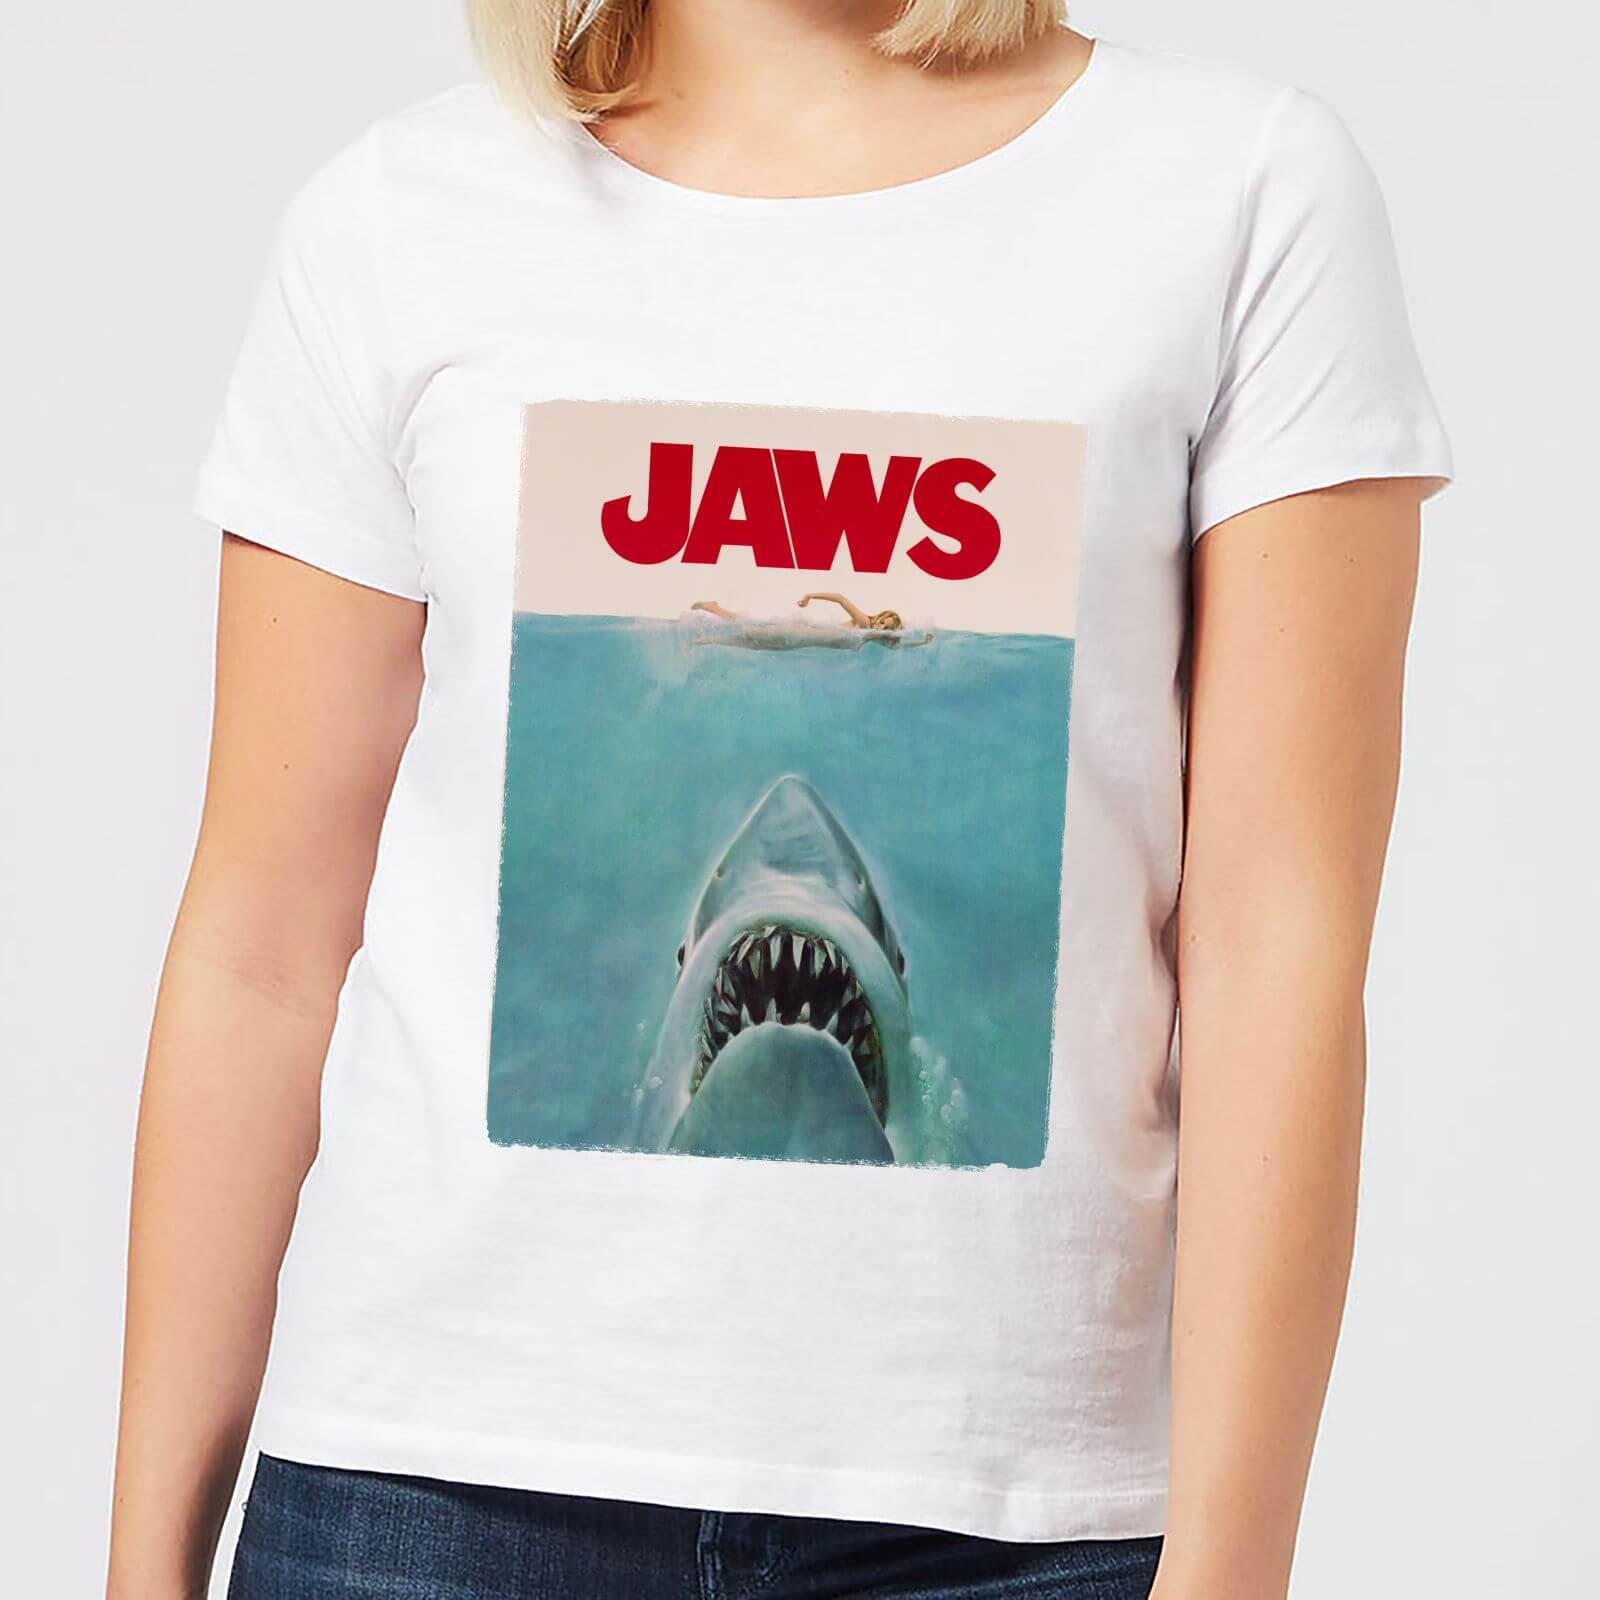 Jaws Classic Poster Women's T-Shirt - White - XL - White